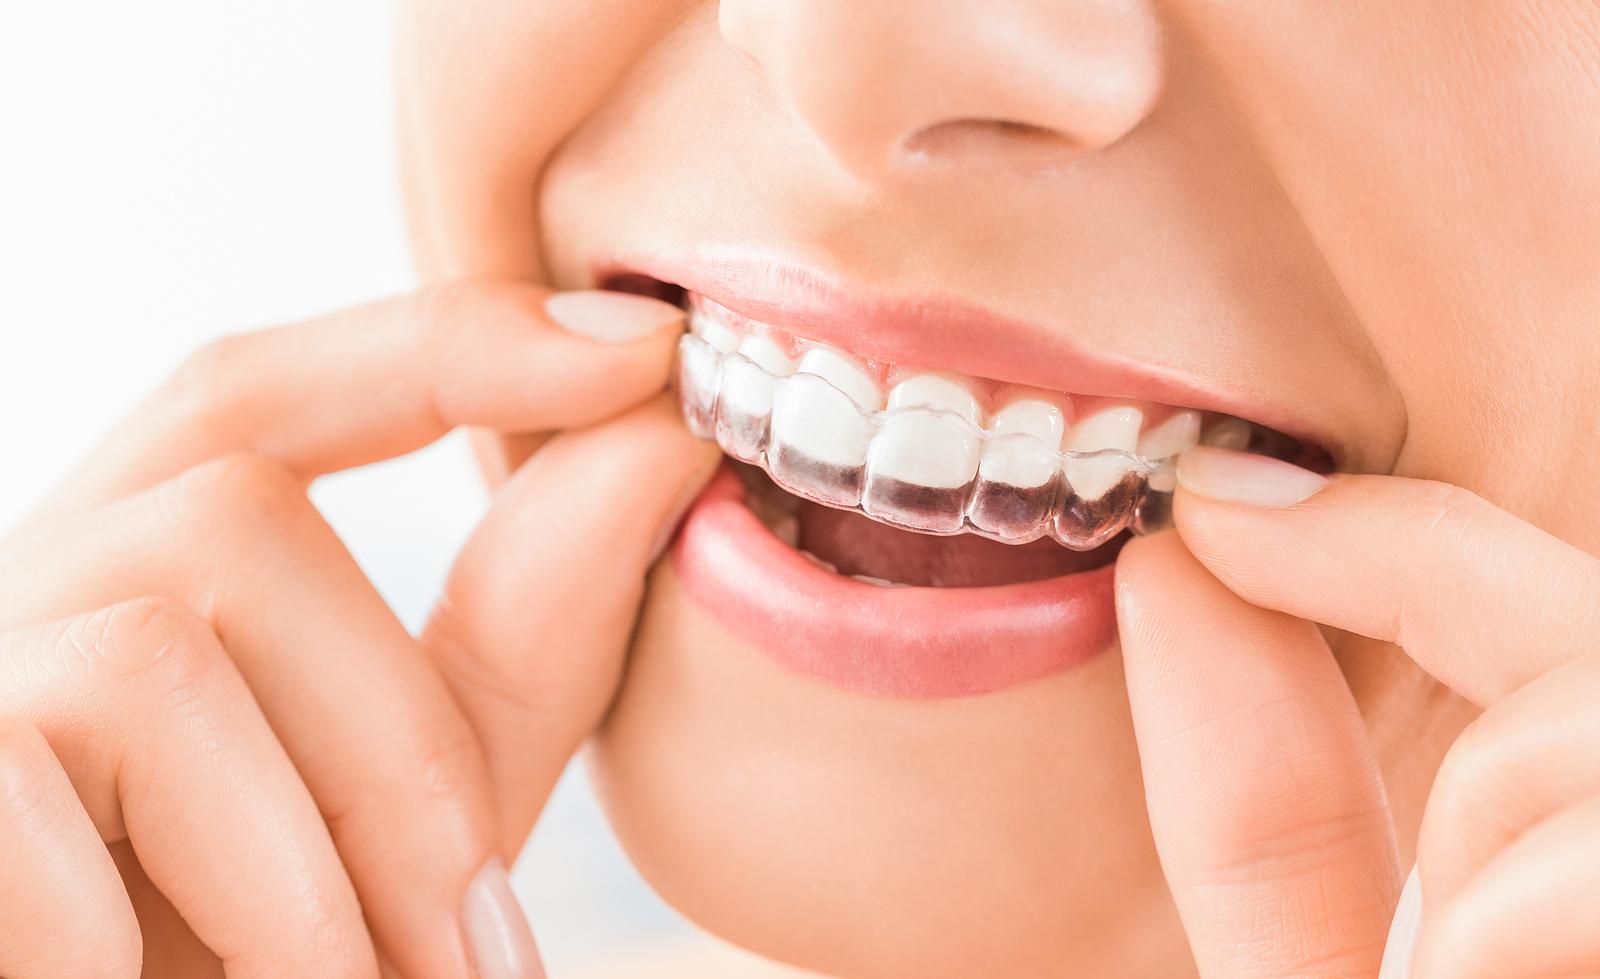 bigstock-Woman-Wearing-Orthodontic-Sili-